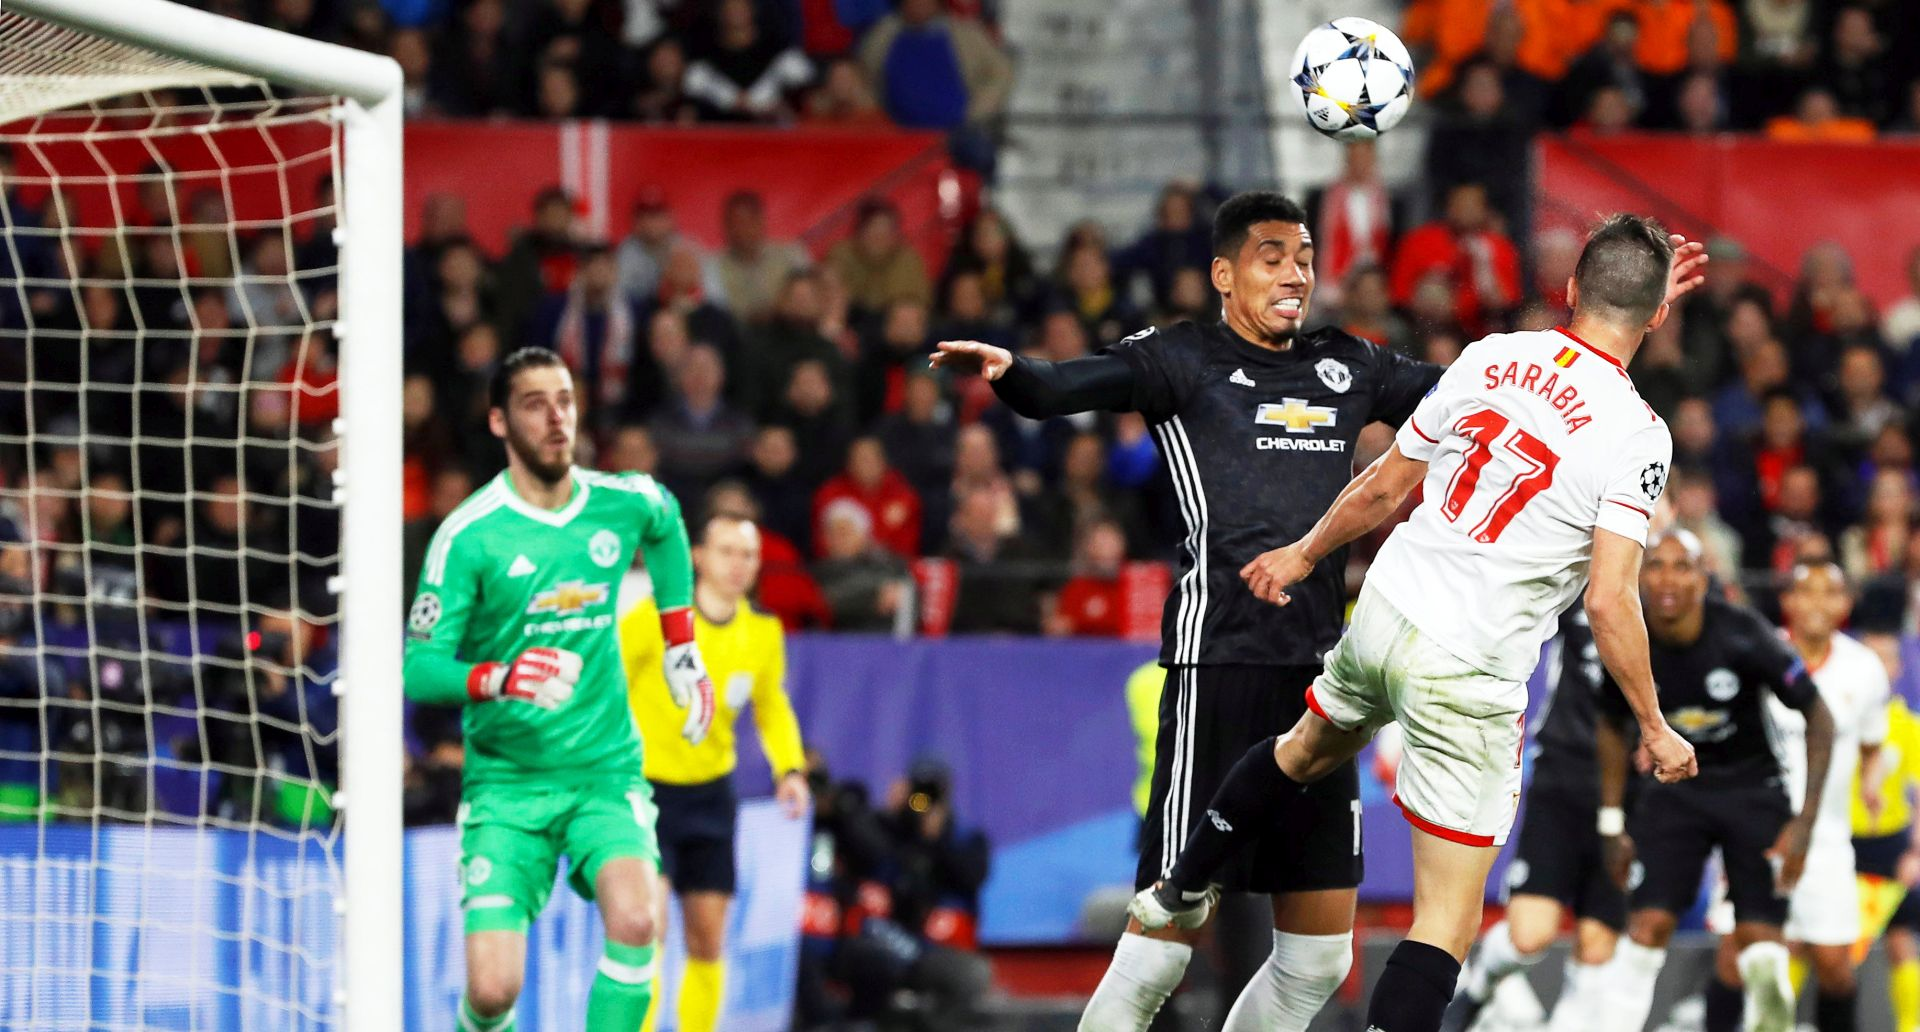 LP Roma lovi zaostatak, United traži pobjedu protiv Seville